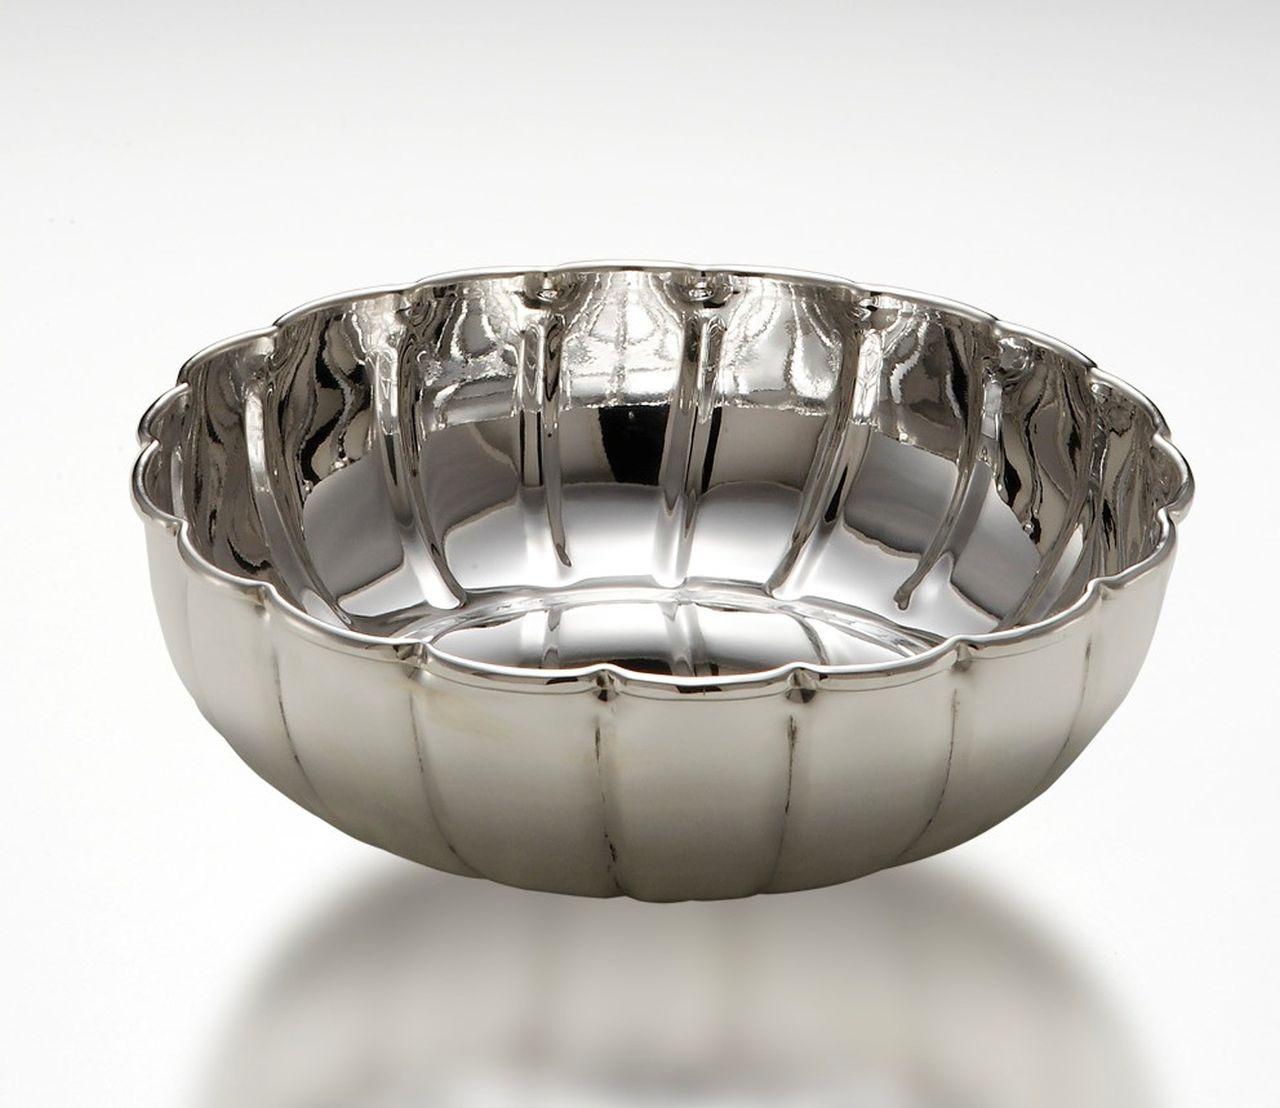 Ciotola tonda benedetta argentato argento sheffield